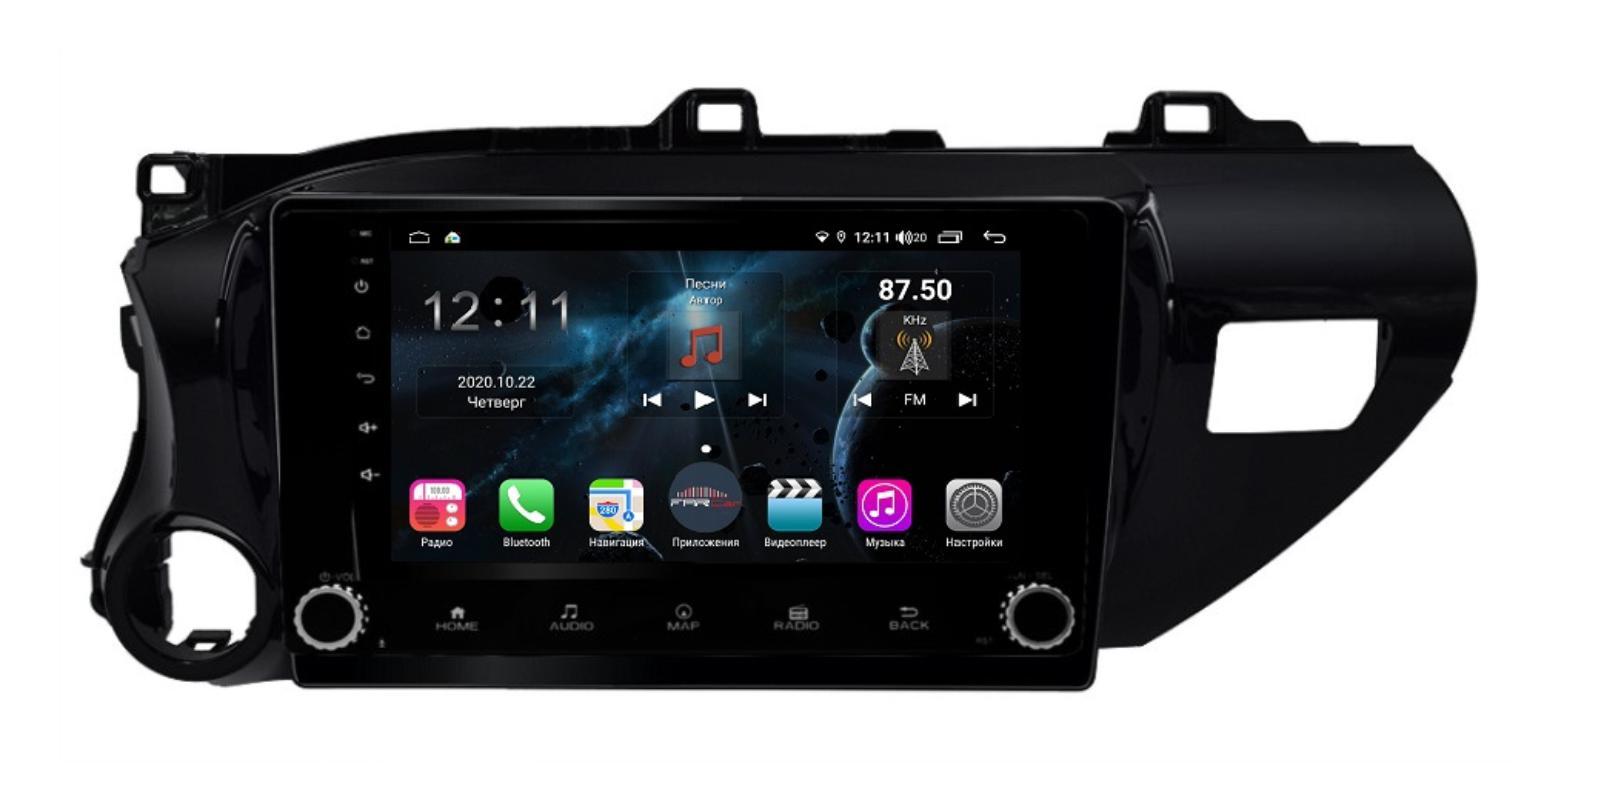 Штатная магнитола FarCar s400 Toyota Hilux на Android (H1077RB) (+ Камера заднего вида в подарок!)